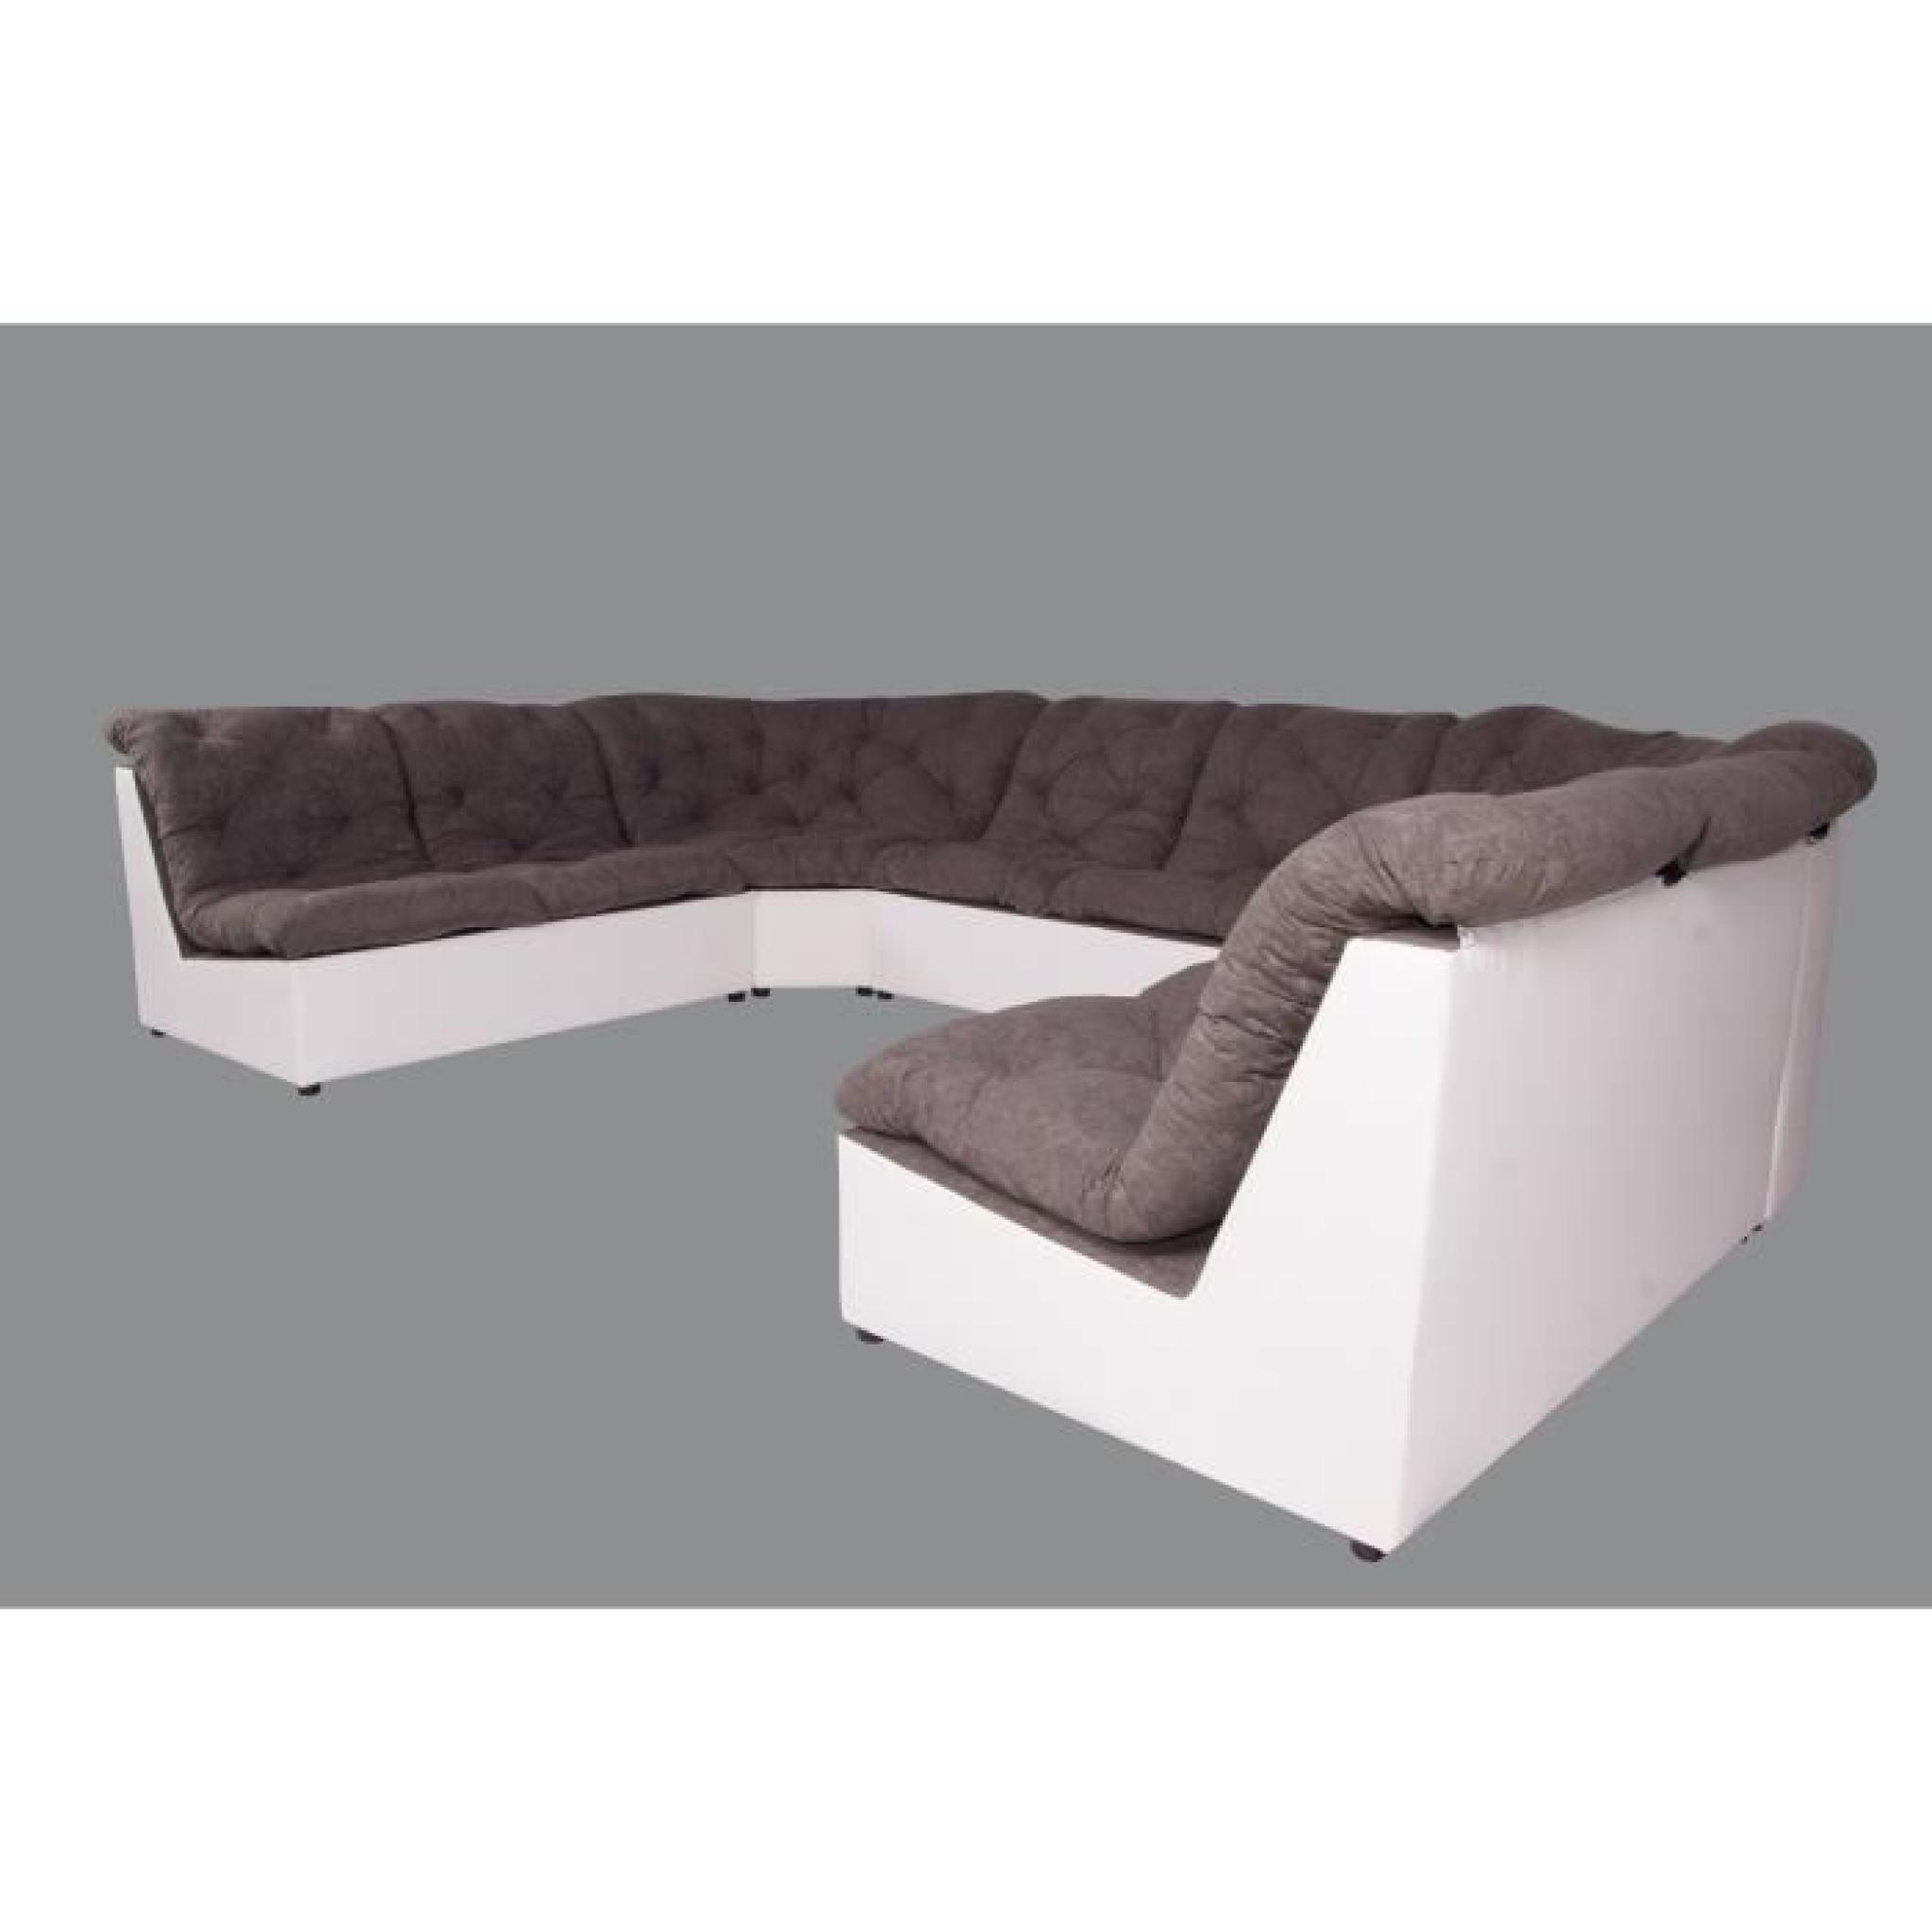 Scala canapé d'angle panoramique modulable 6 places